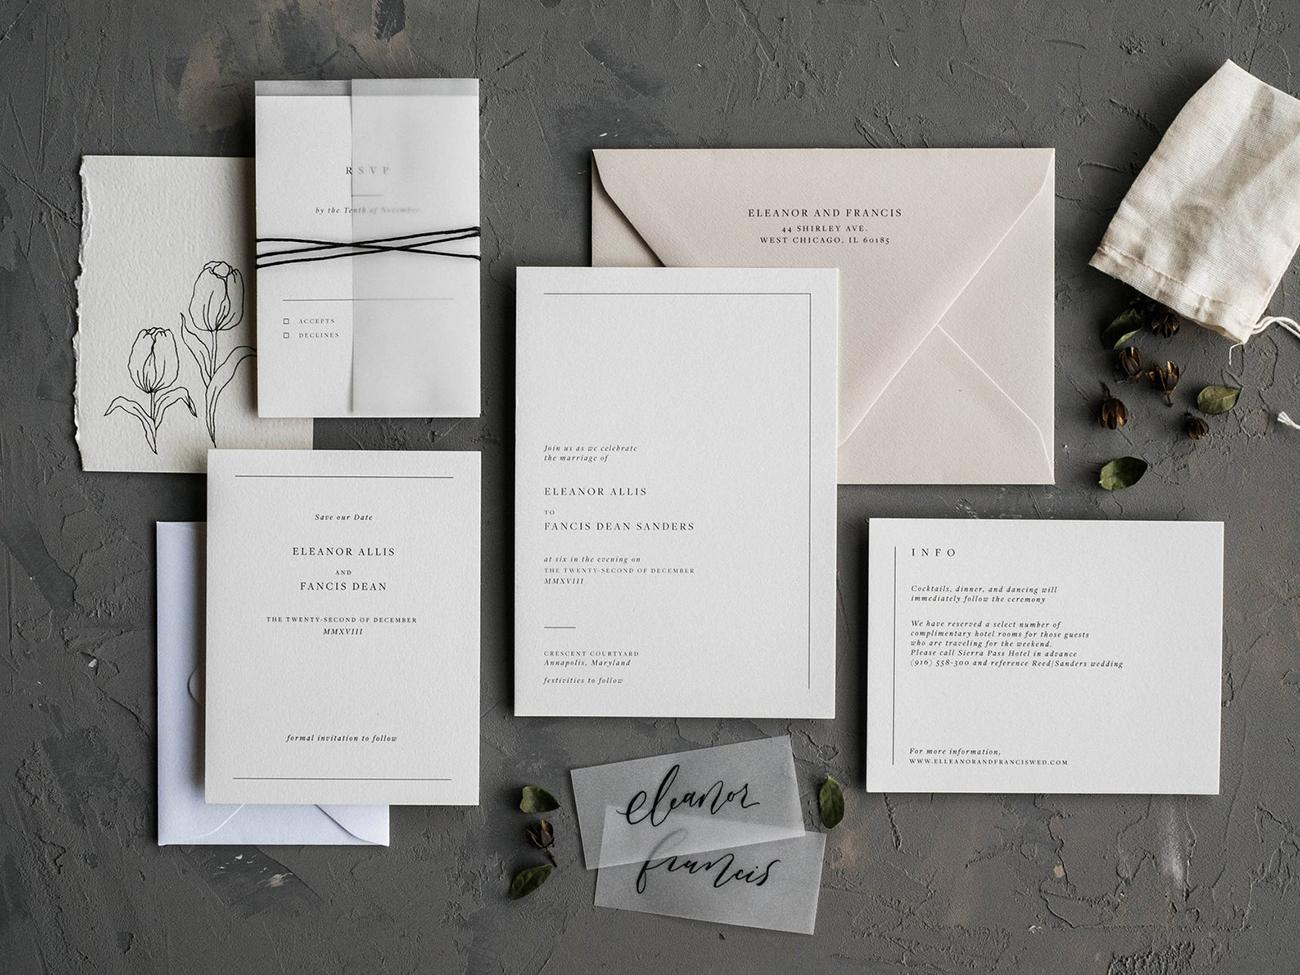 etsy modern wedding invitation with minimal type